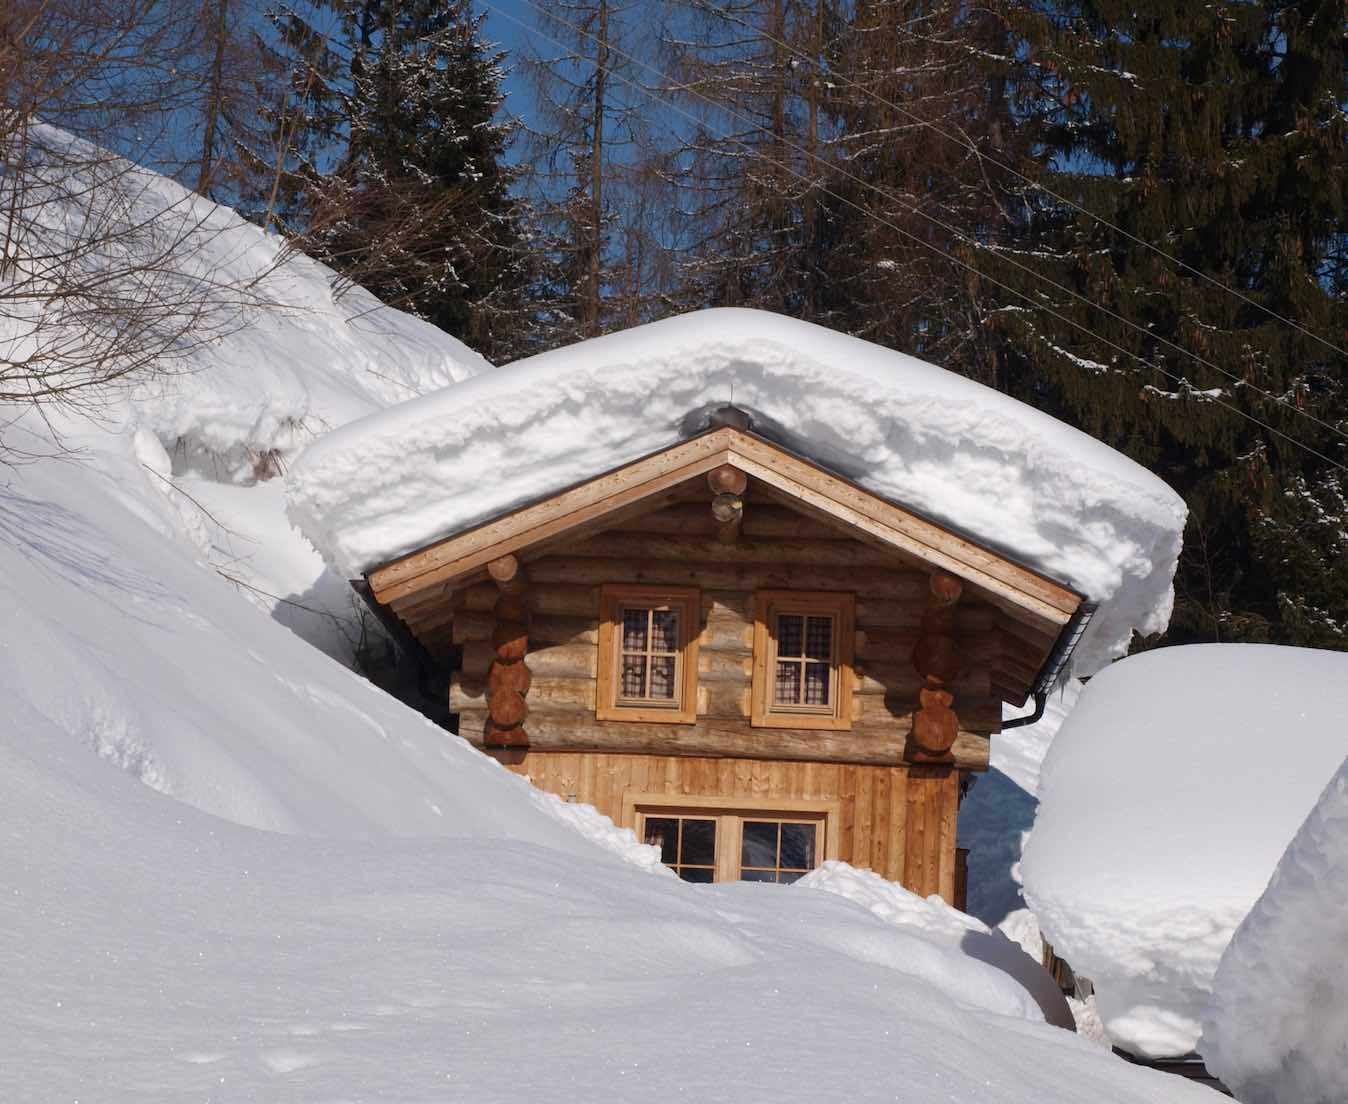 Copy of Winterurlaub im Chalet